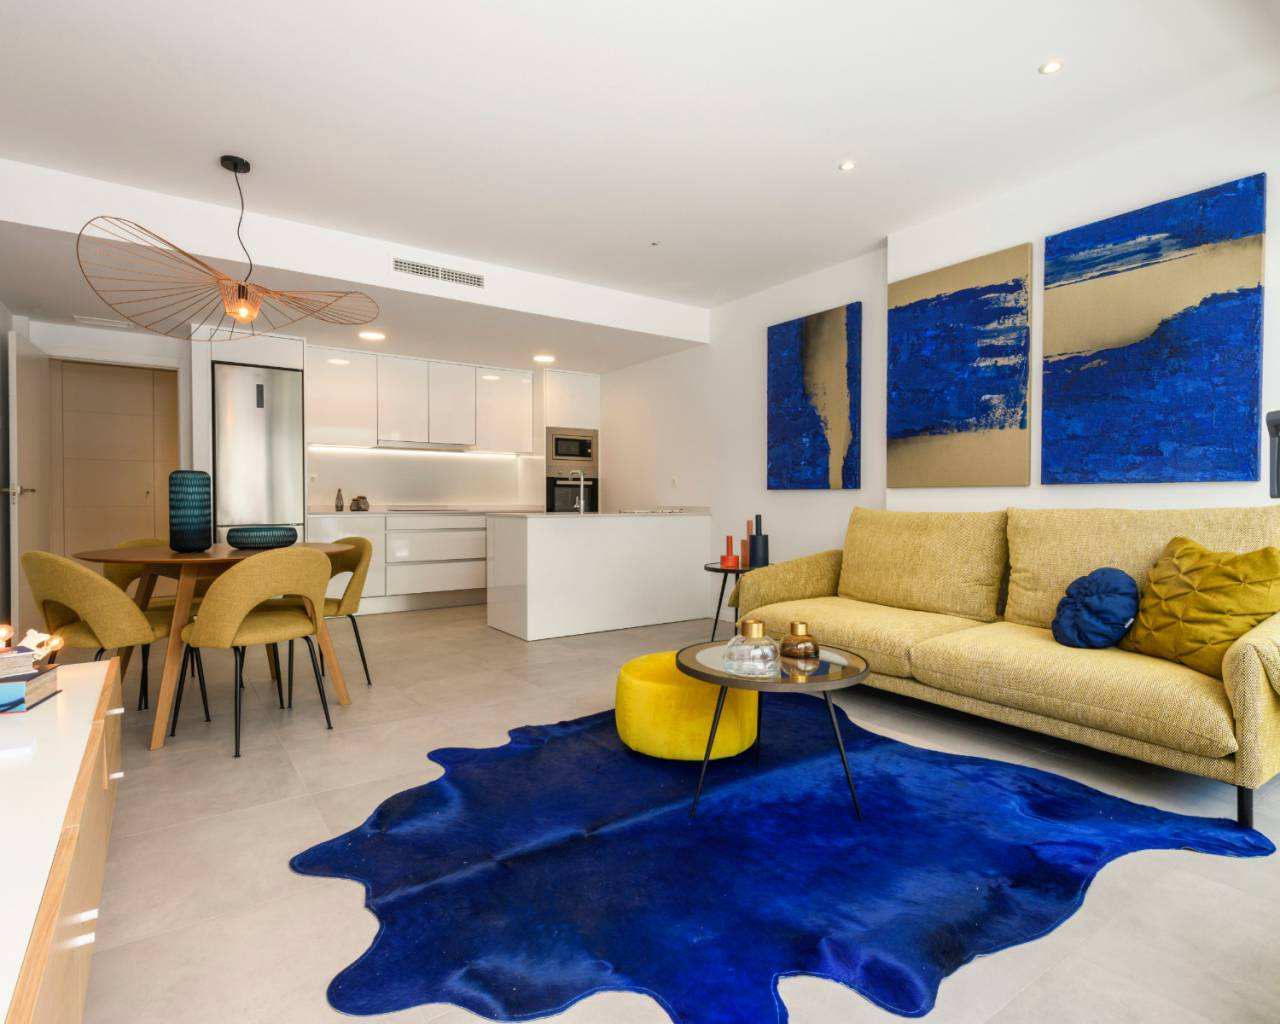 nieuwbouw-appartement-orihuela-costa-campoamor_5595_xl